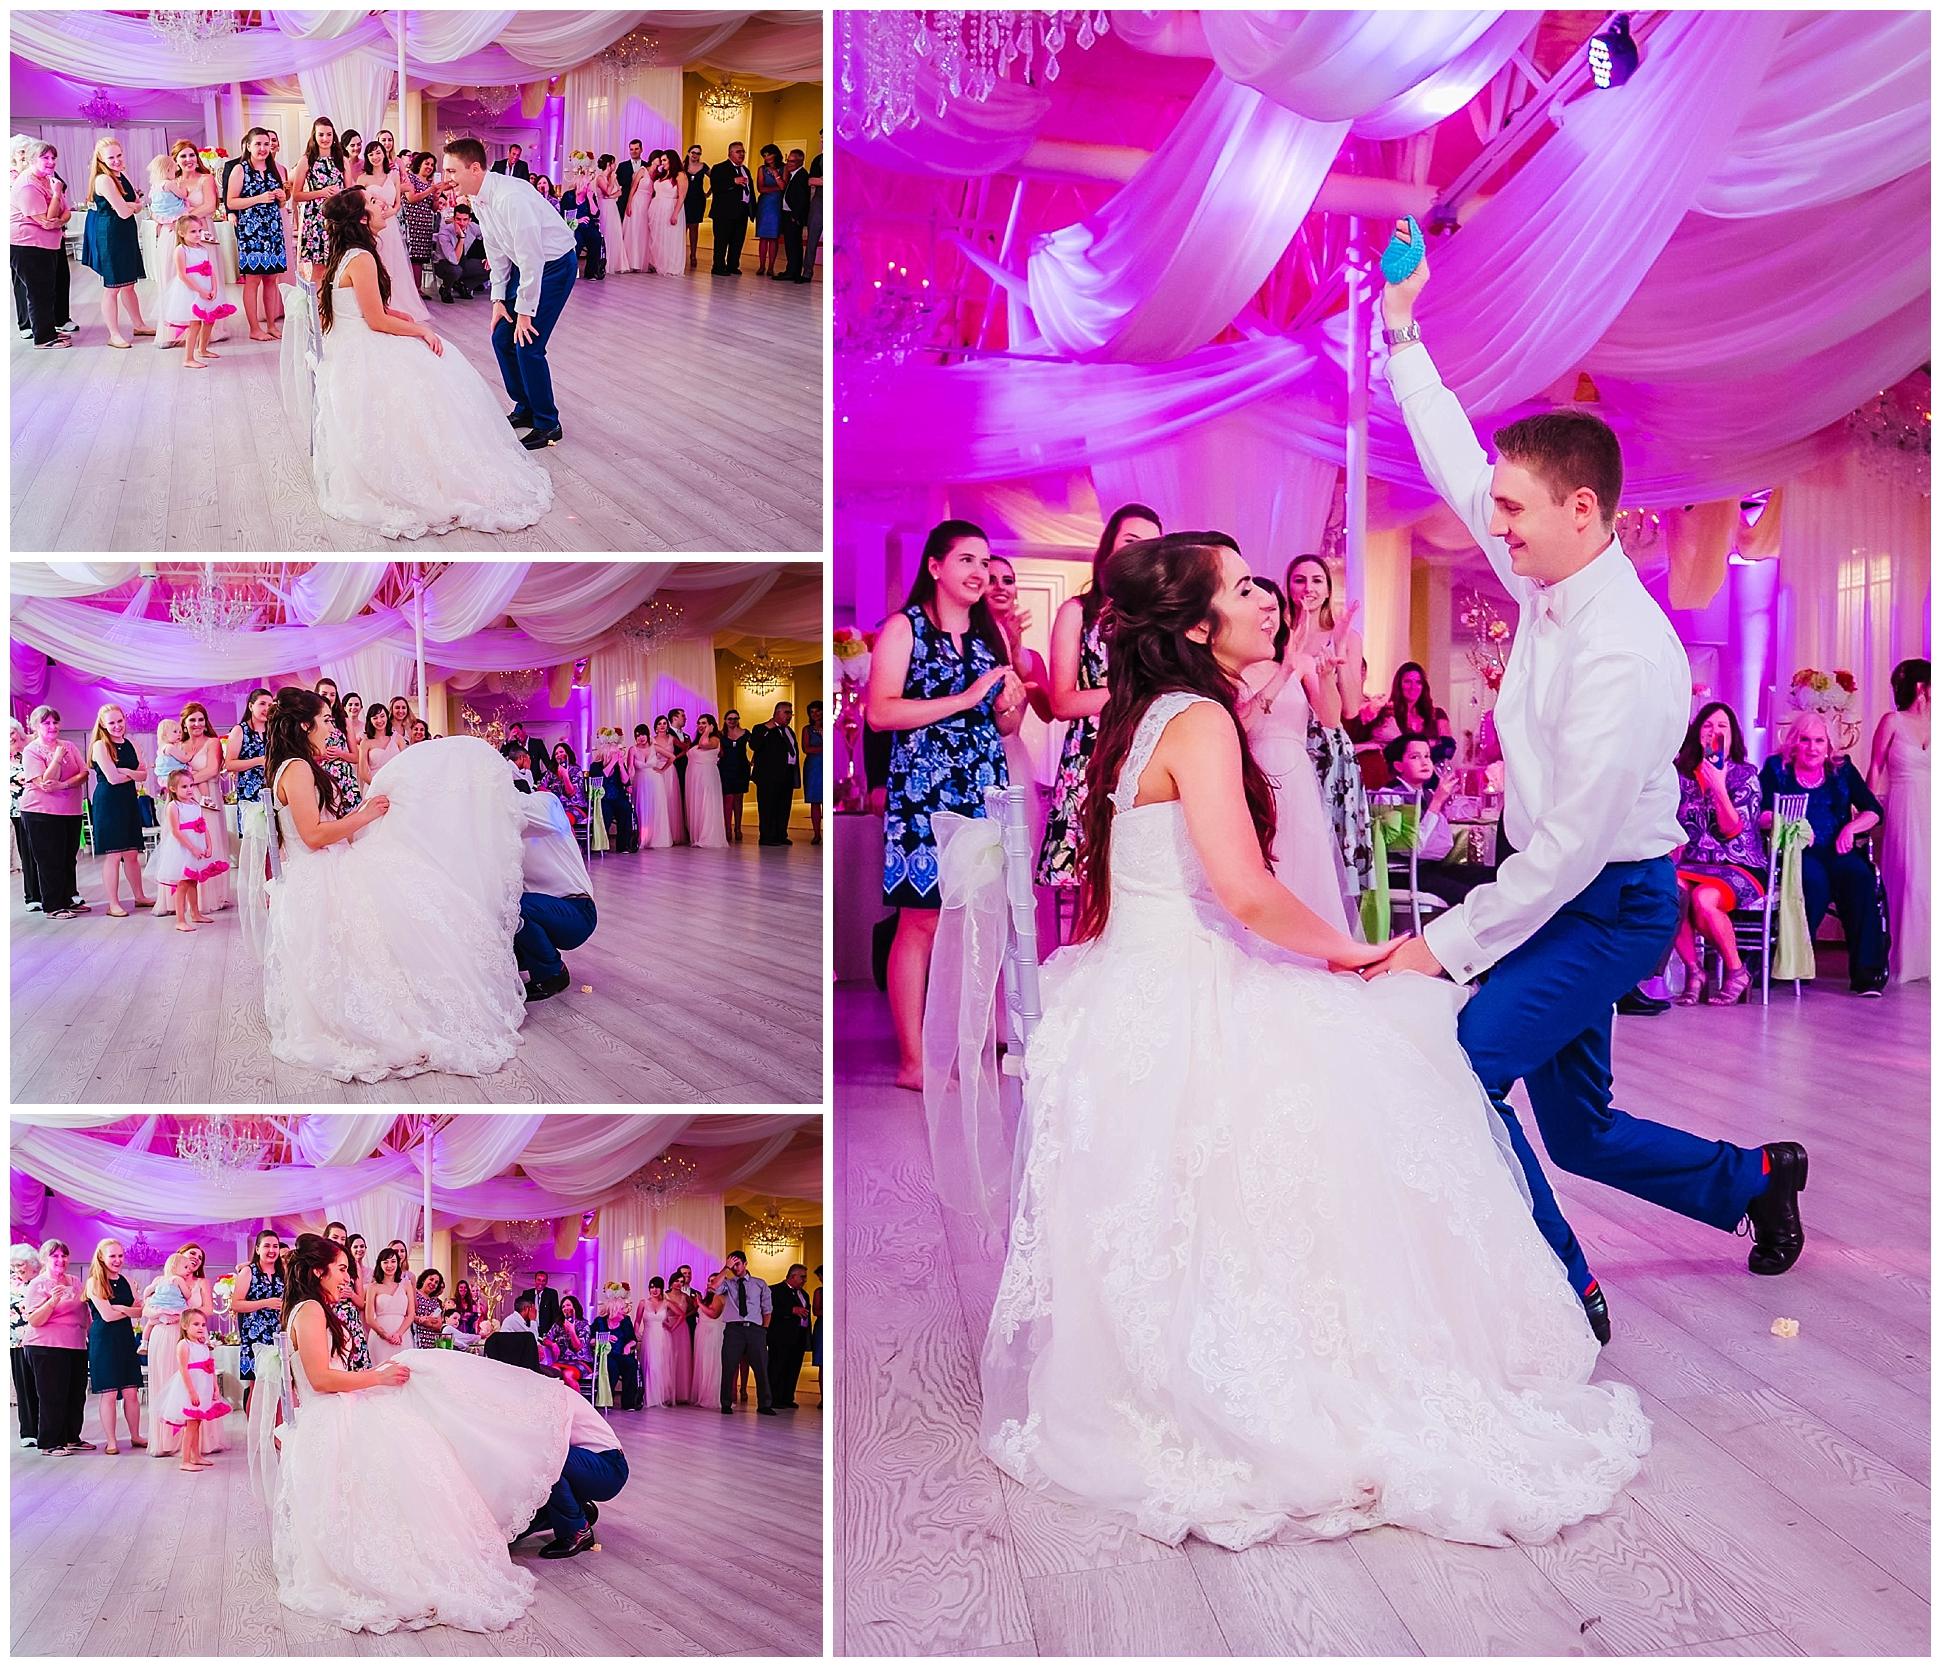 st-pete-wedding-photographer-sunken-gardens-crystal-ballroom-princess-dancer_0204.jpg